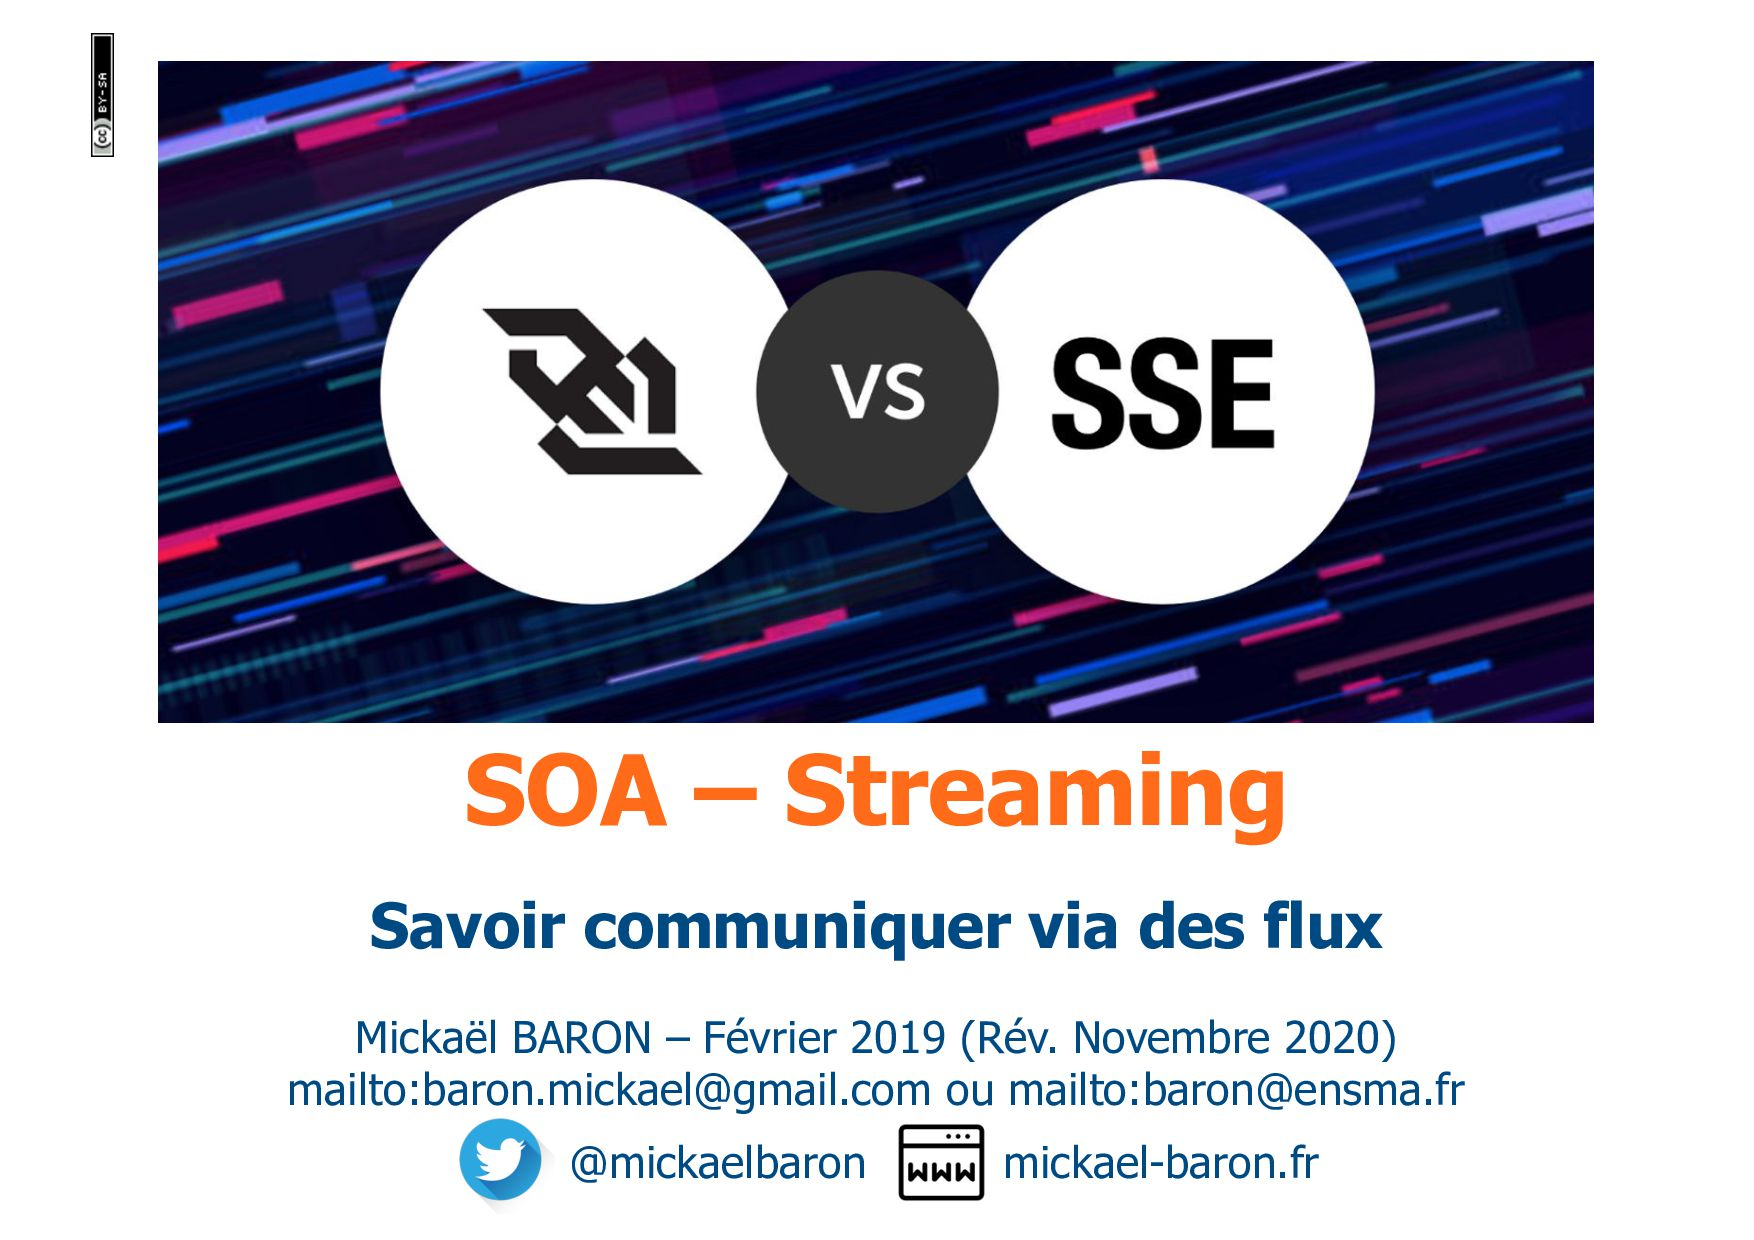 SOA – Streaming Mickaël BARON – Février 2019 ma...